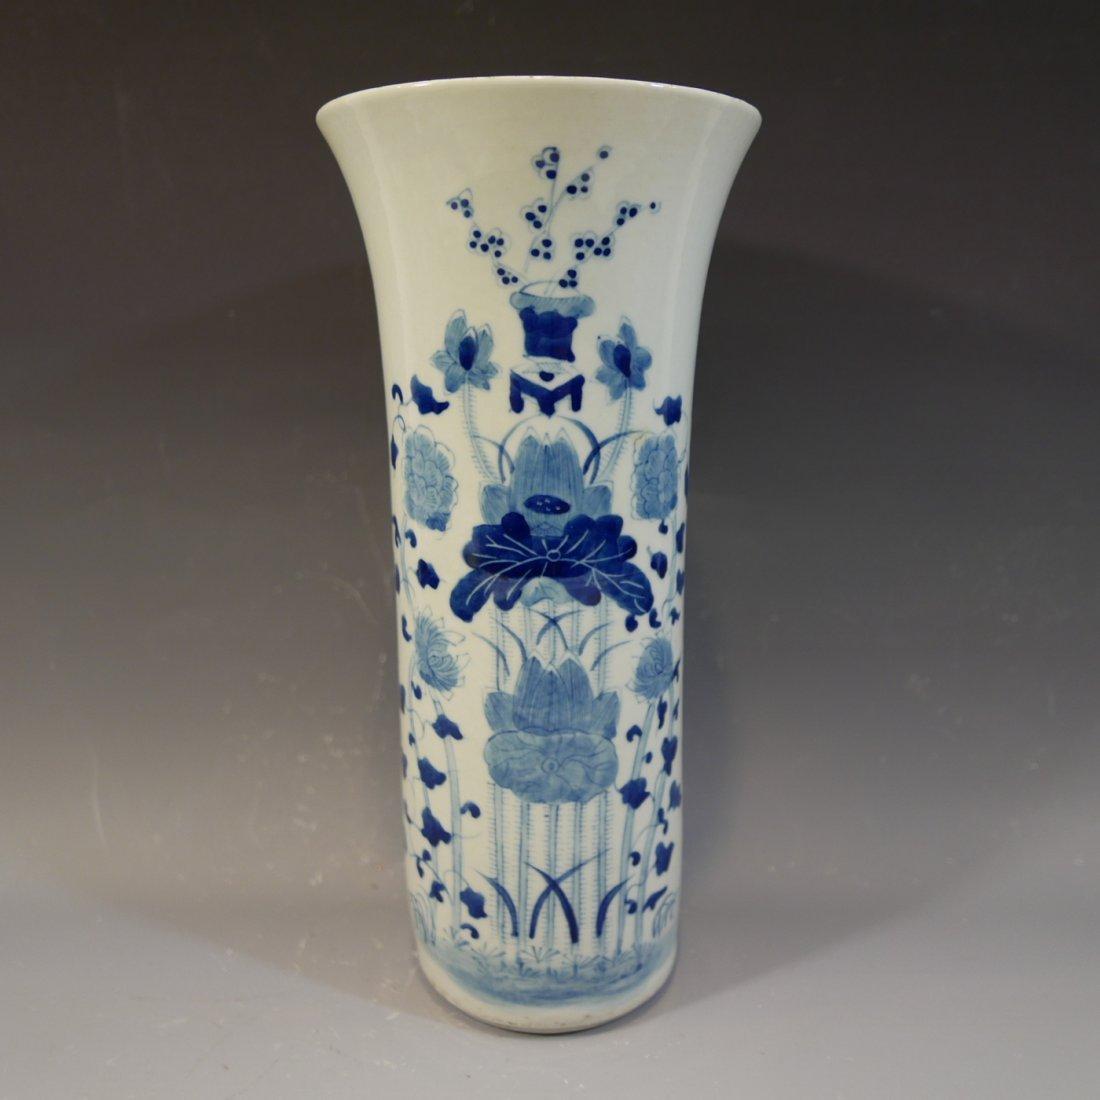 ANTIQUE CHINESE BLUE WHITE PORCELAIN BEAKER VASE - 2